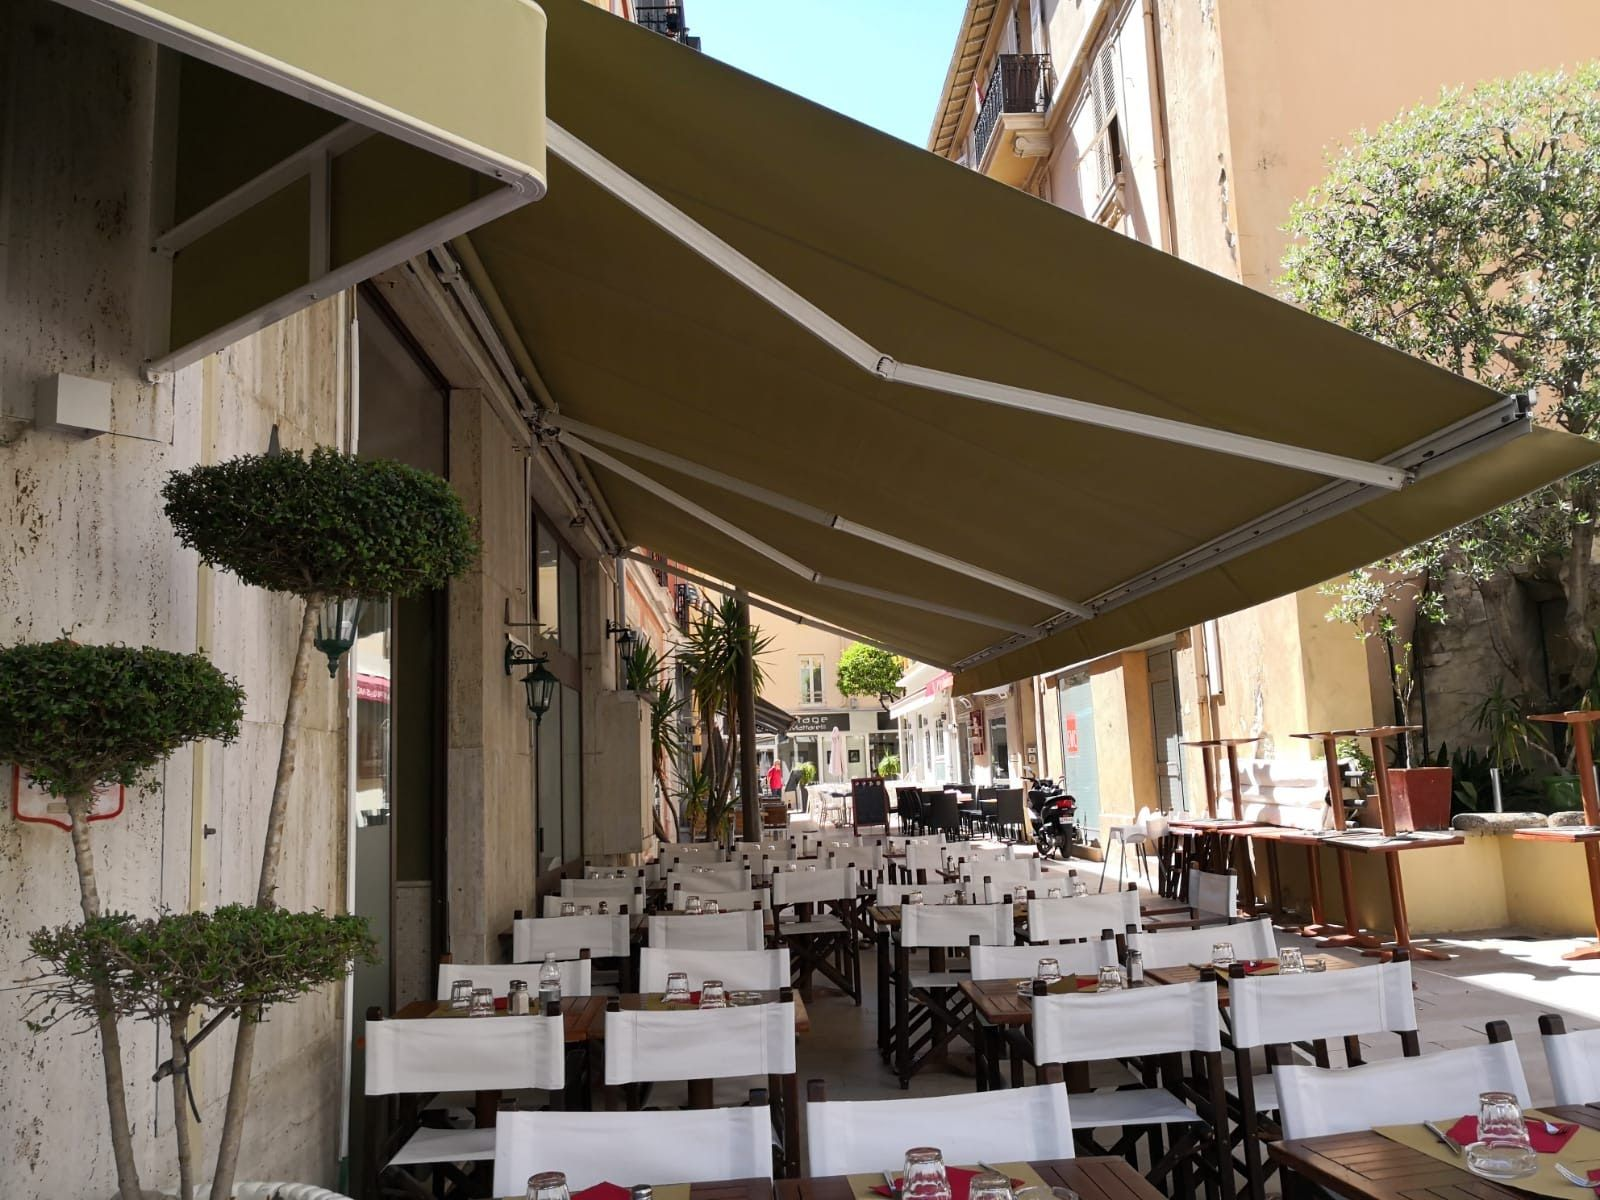 tendedasole_montecarlo_domus_point_1